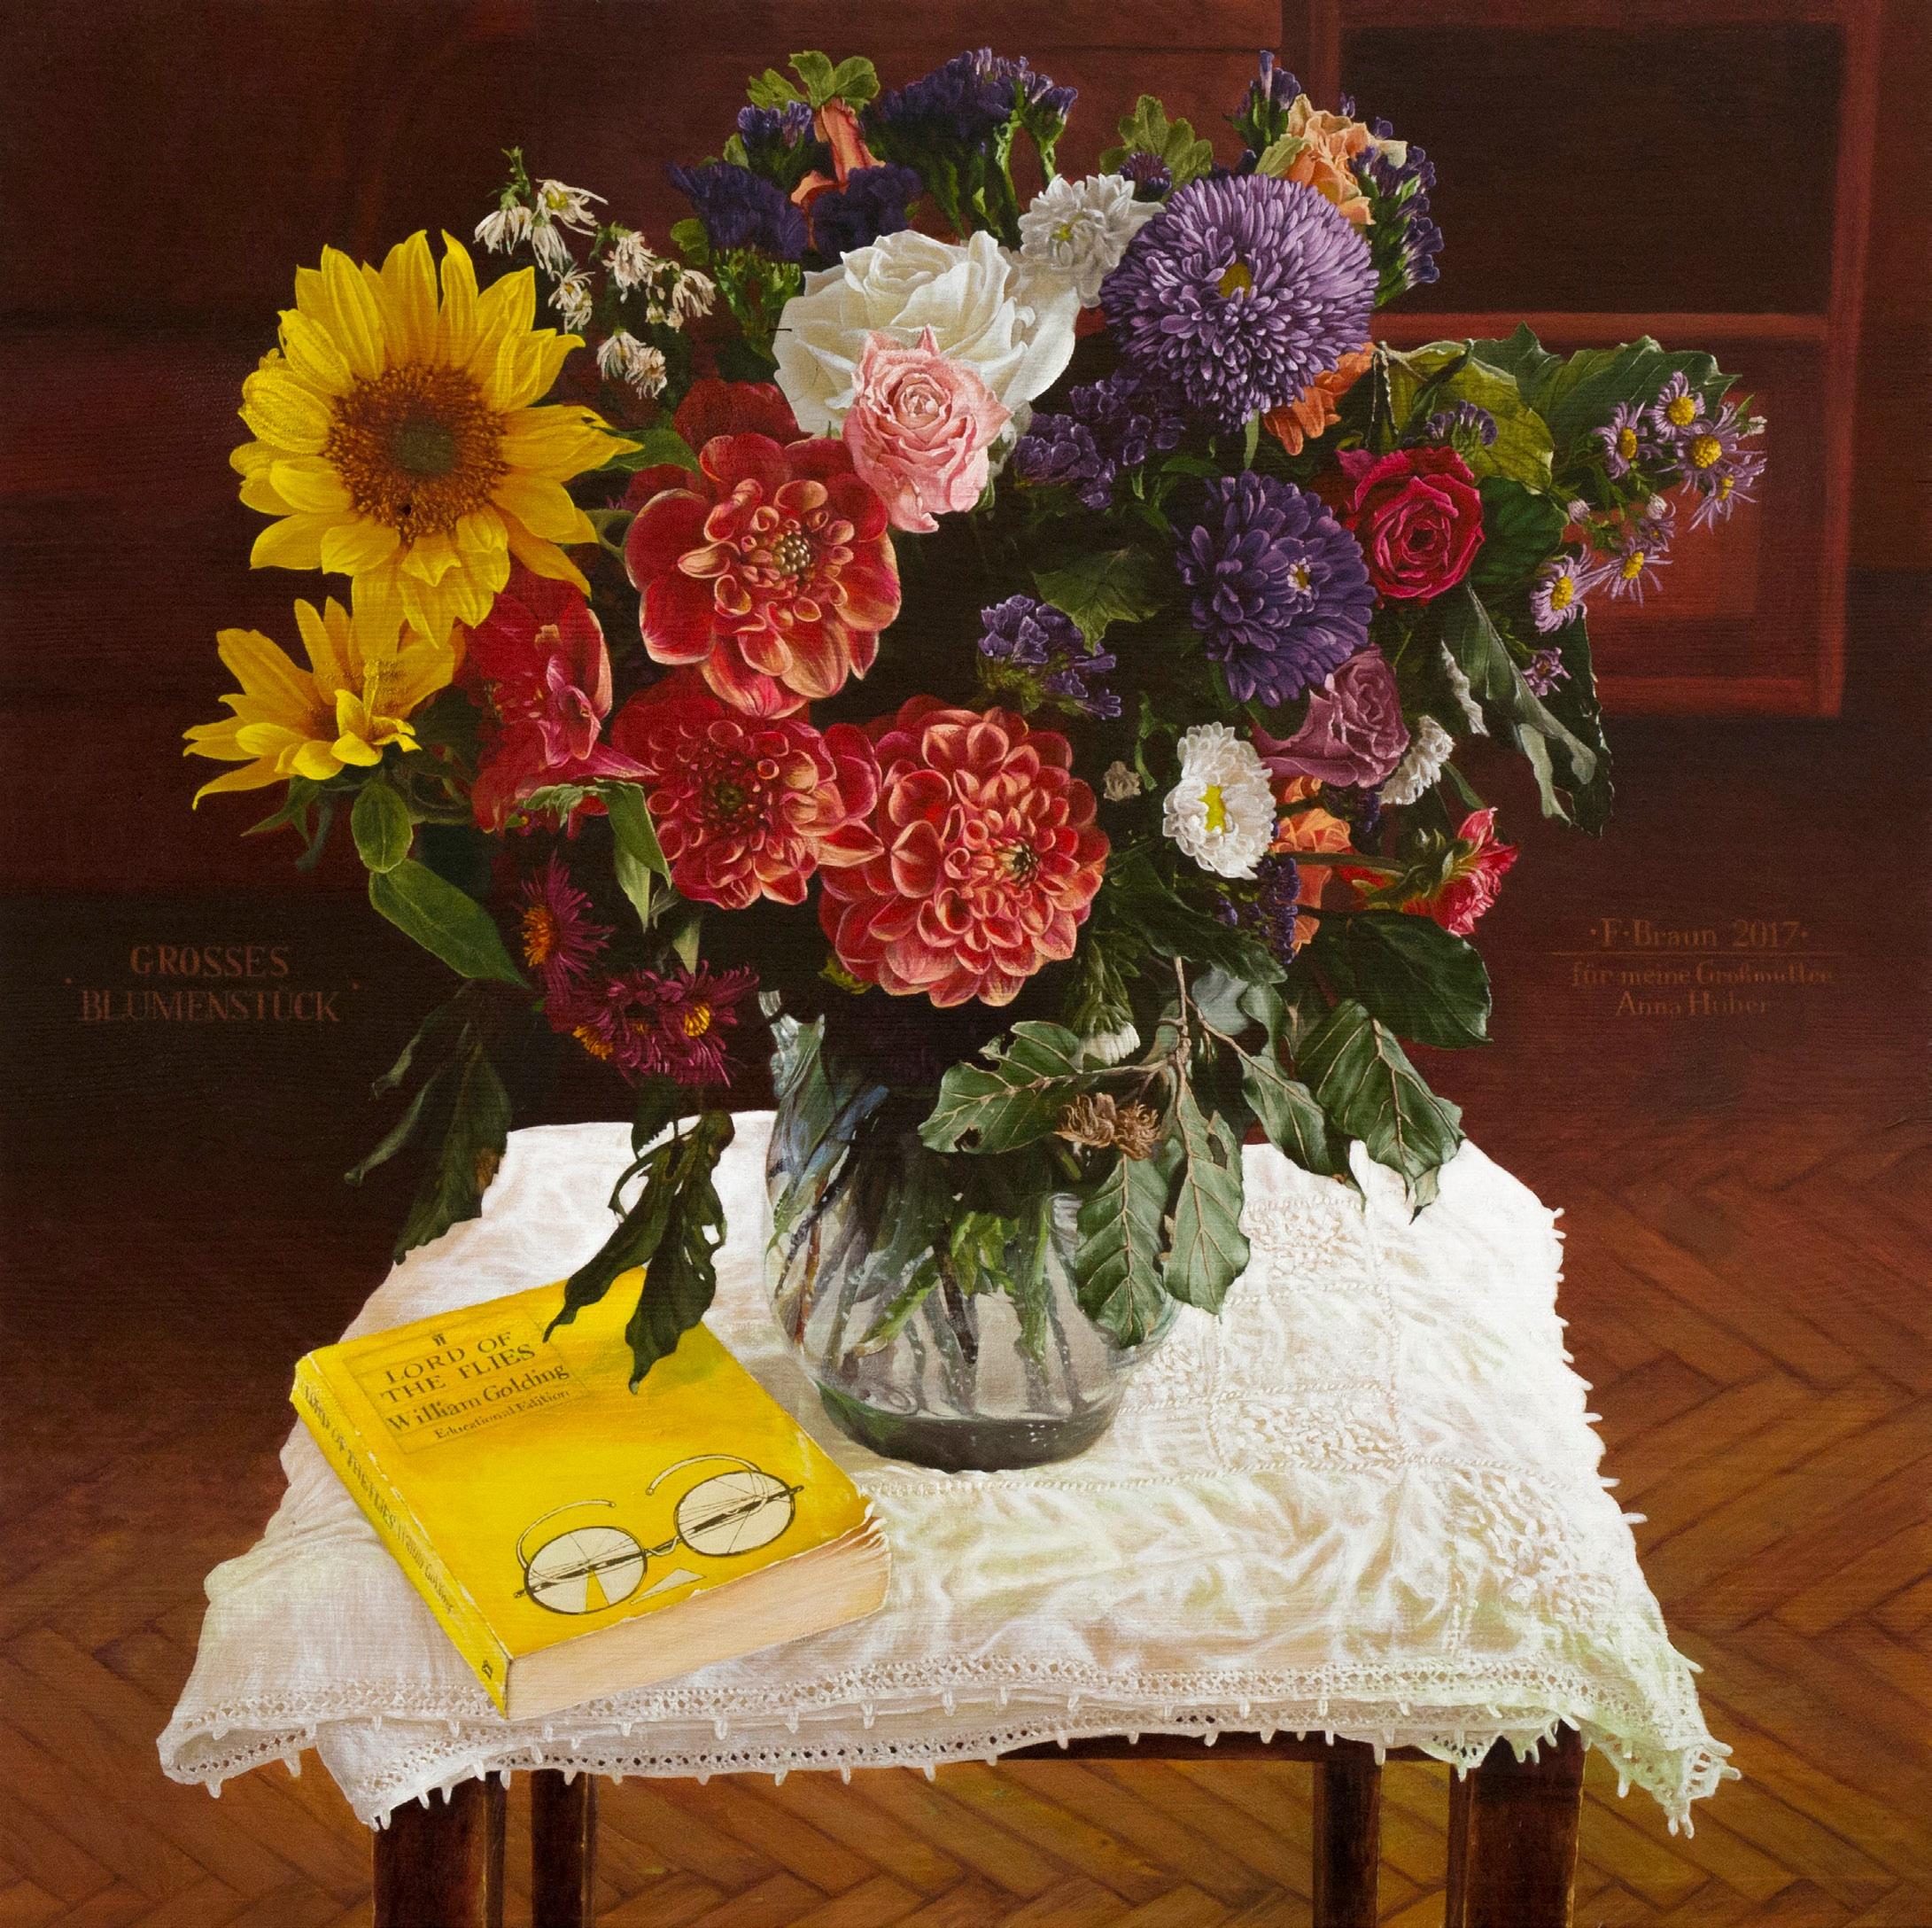 Franz Braun, A Bunch of Flowers, 2017, oil on wood, 55 x 55cm